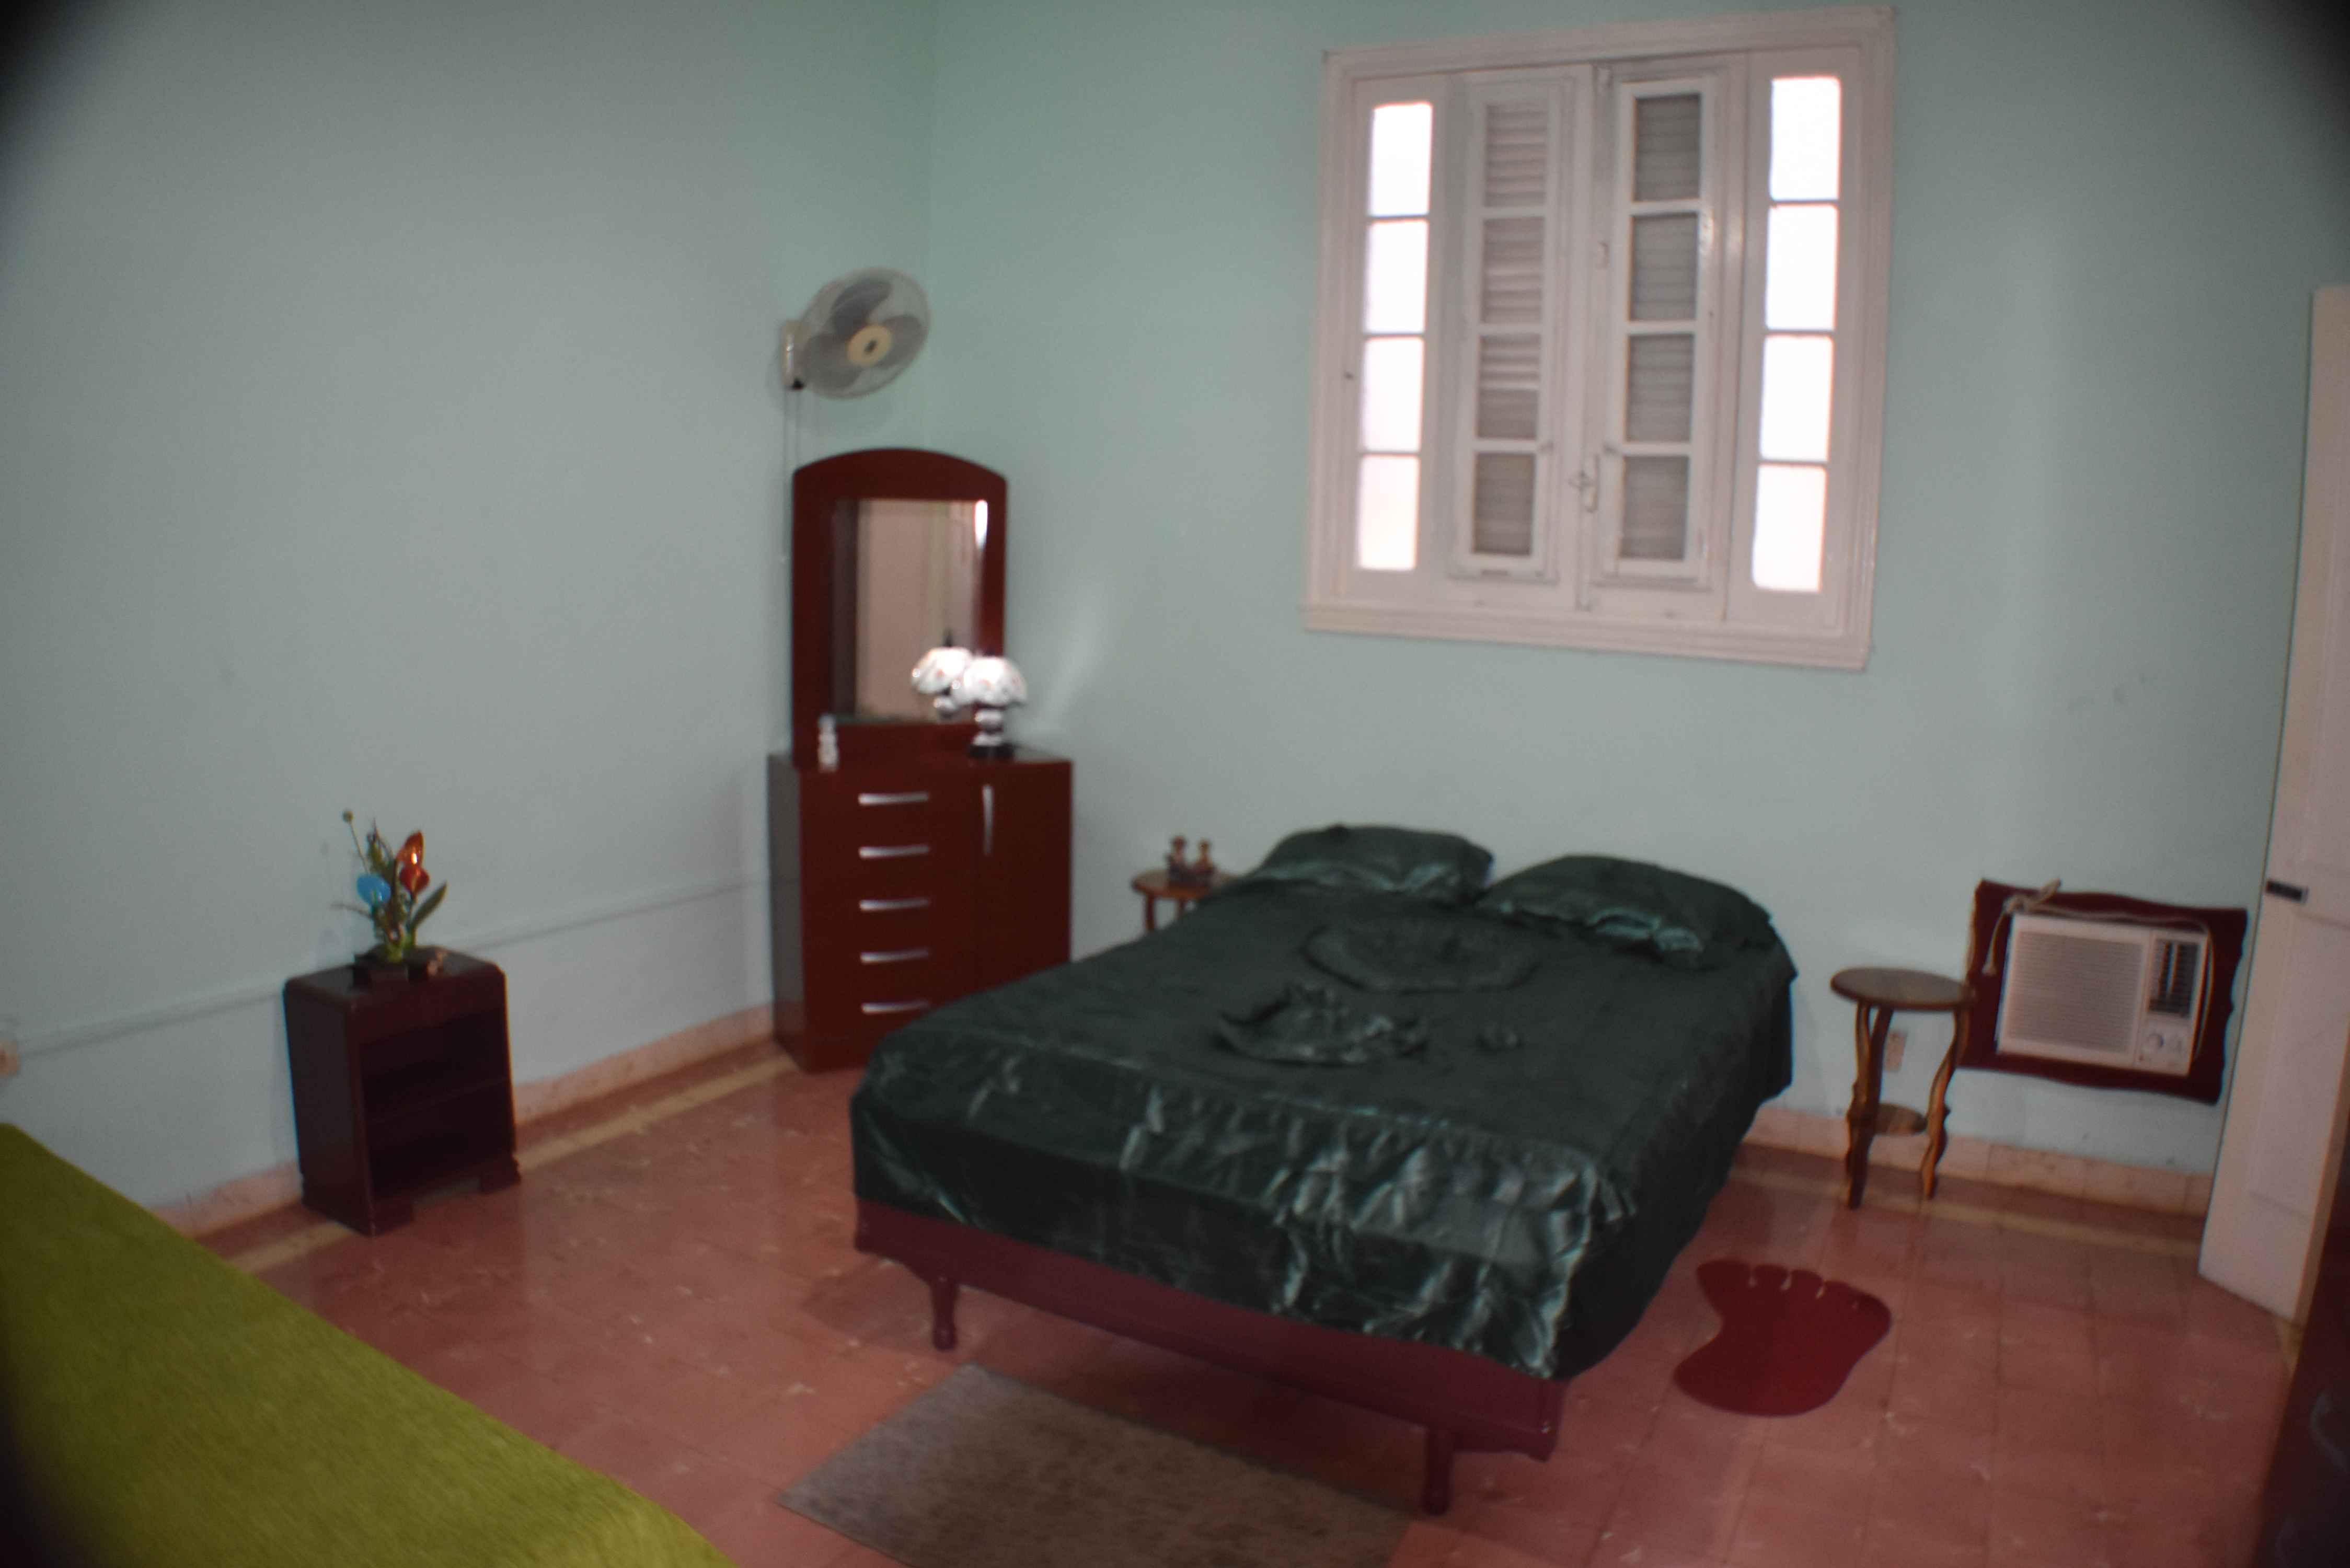 HAV313 - Room 2 Triple bedroom with private bathroom